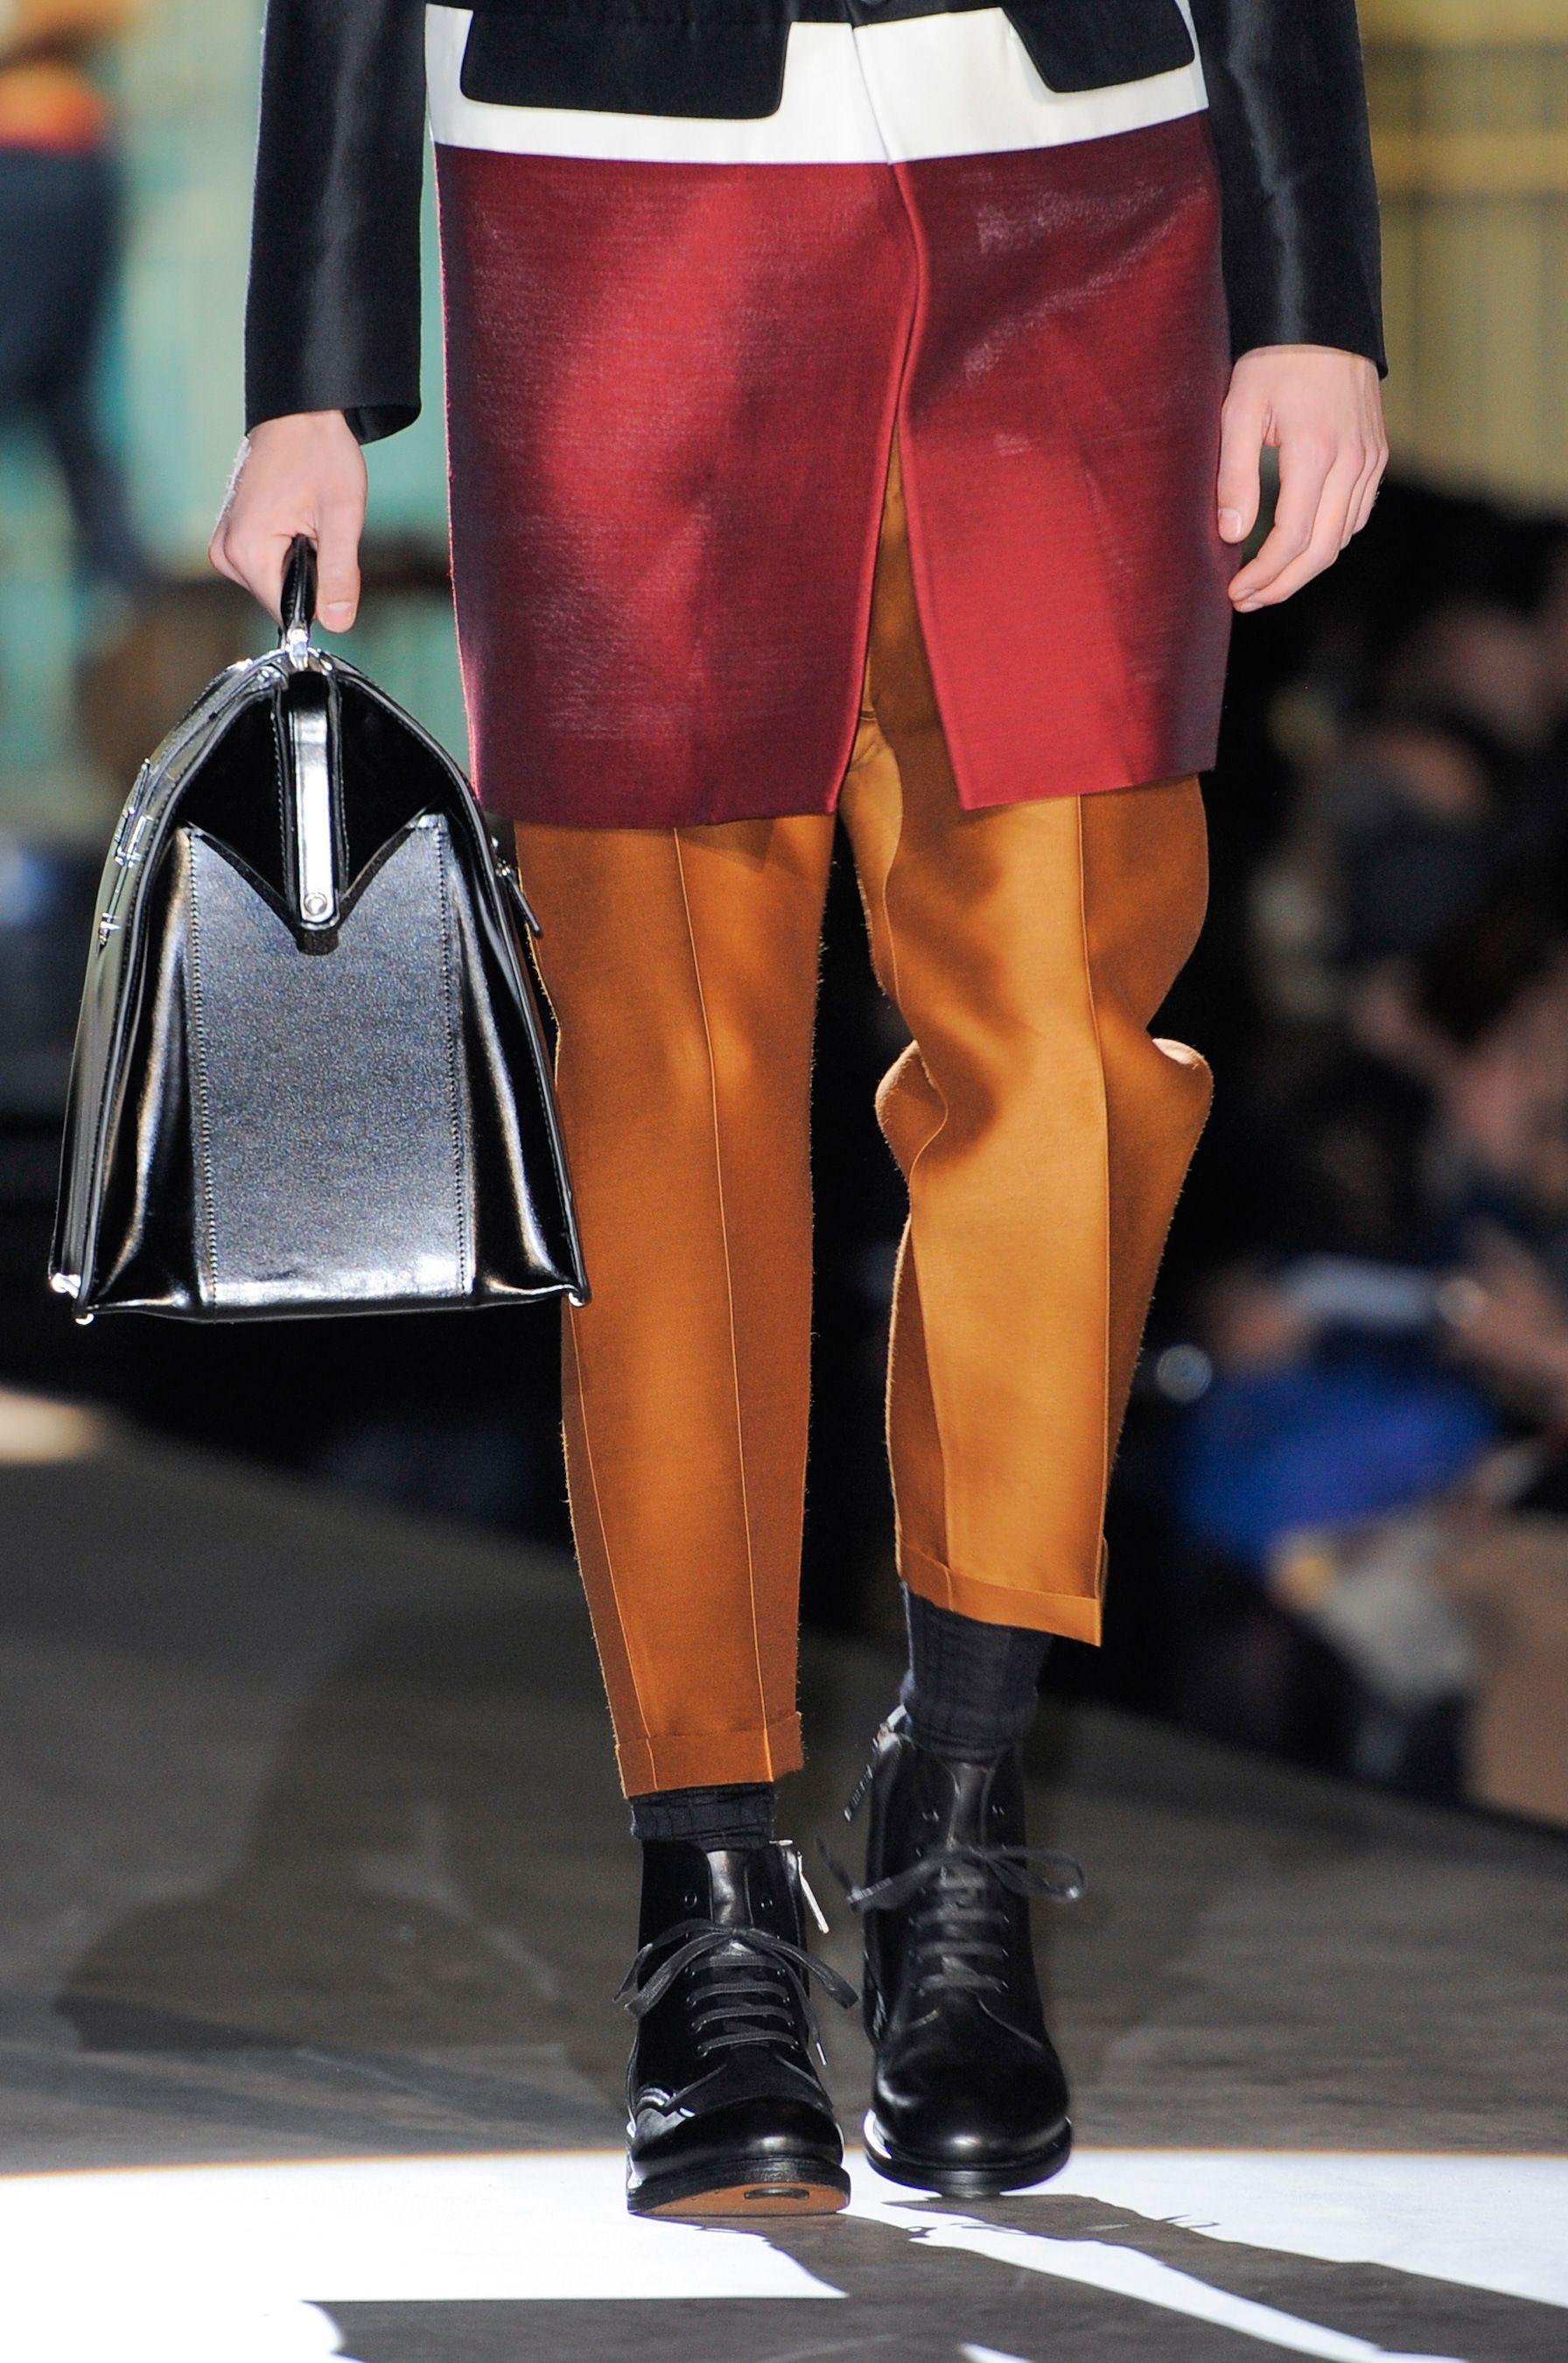 DSQUARED2 Fall/Winter 2014 Milan Fashion Week 2014. #